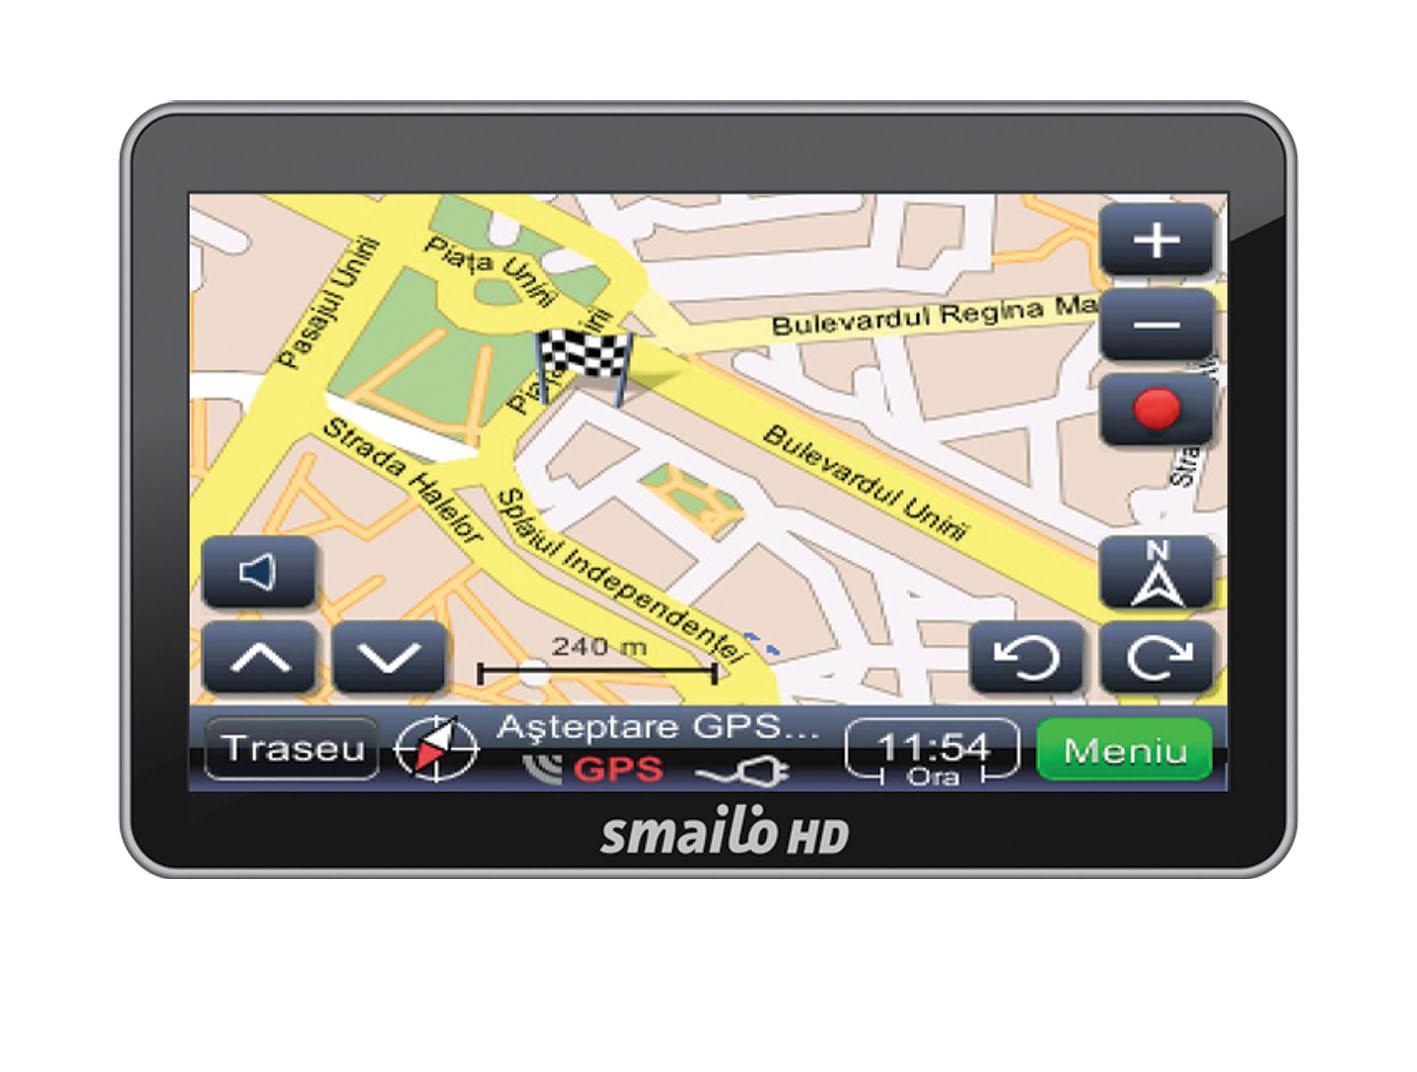 Sistem de navigatie GPS Smailo HD 4.3 RO 4.3